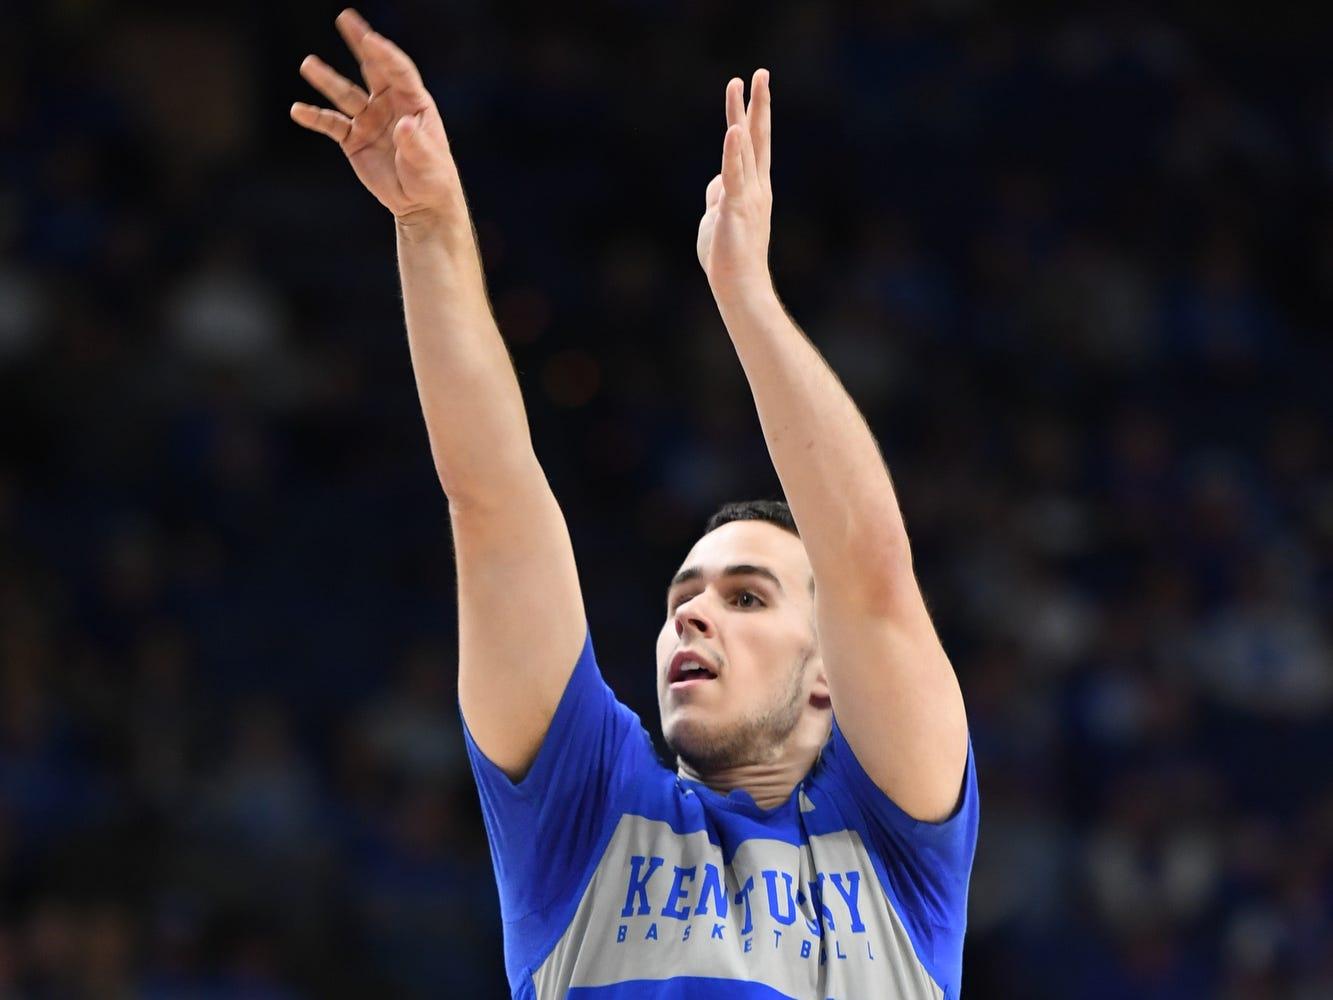 UK G Brad Calipari shoots during the University of Kentucky mens basketball Blue/White game at Rupp Arena in Lexington, Kentucky on Sunday, October 21, 2018.